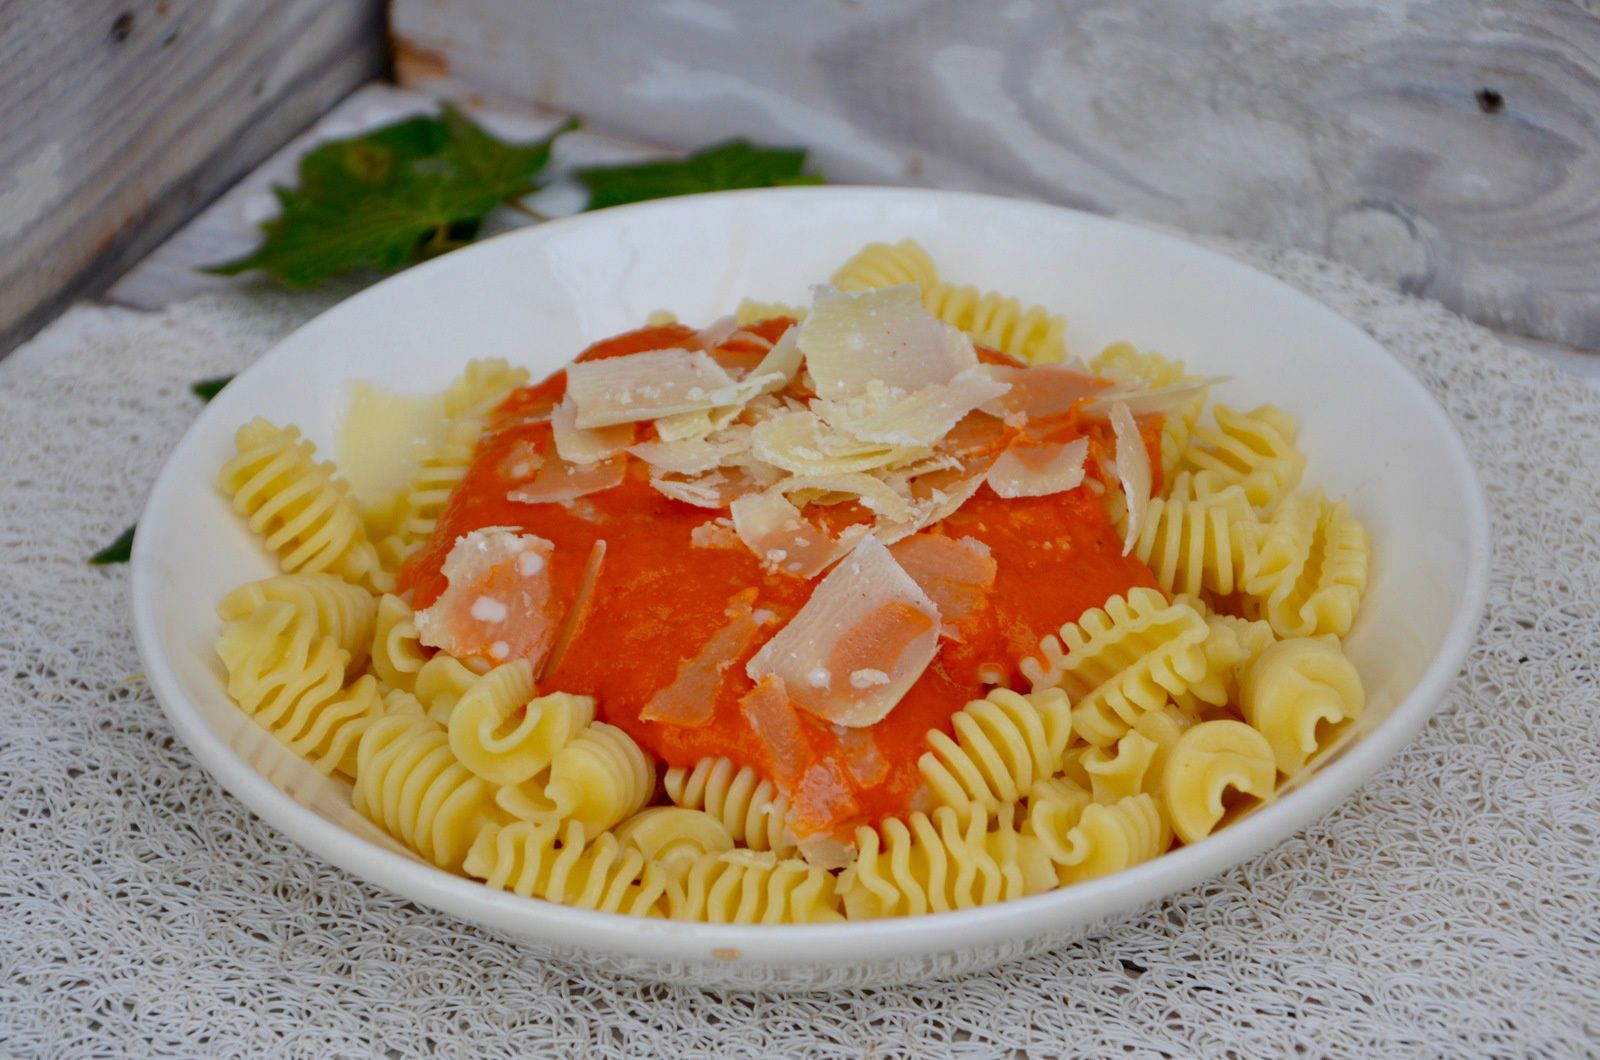 Radiatori sauce tomates/poivrons